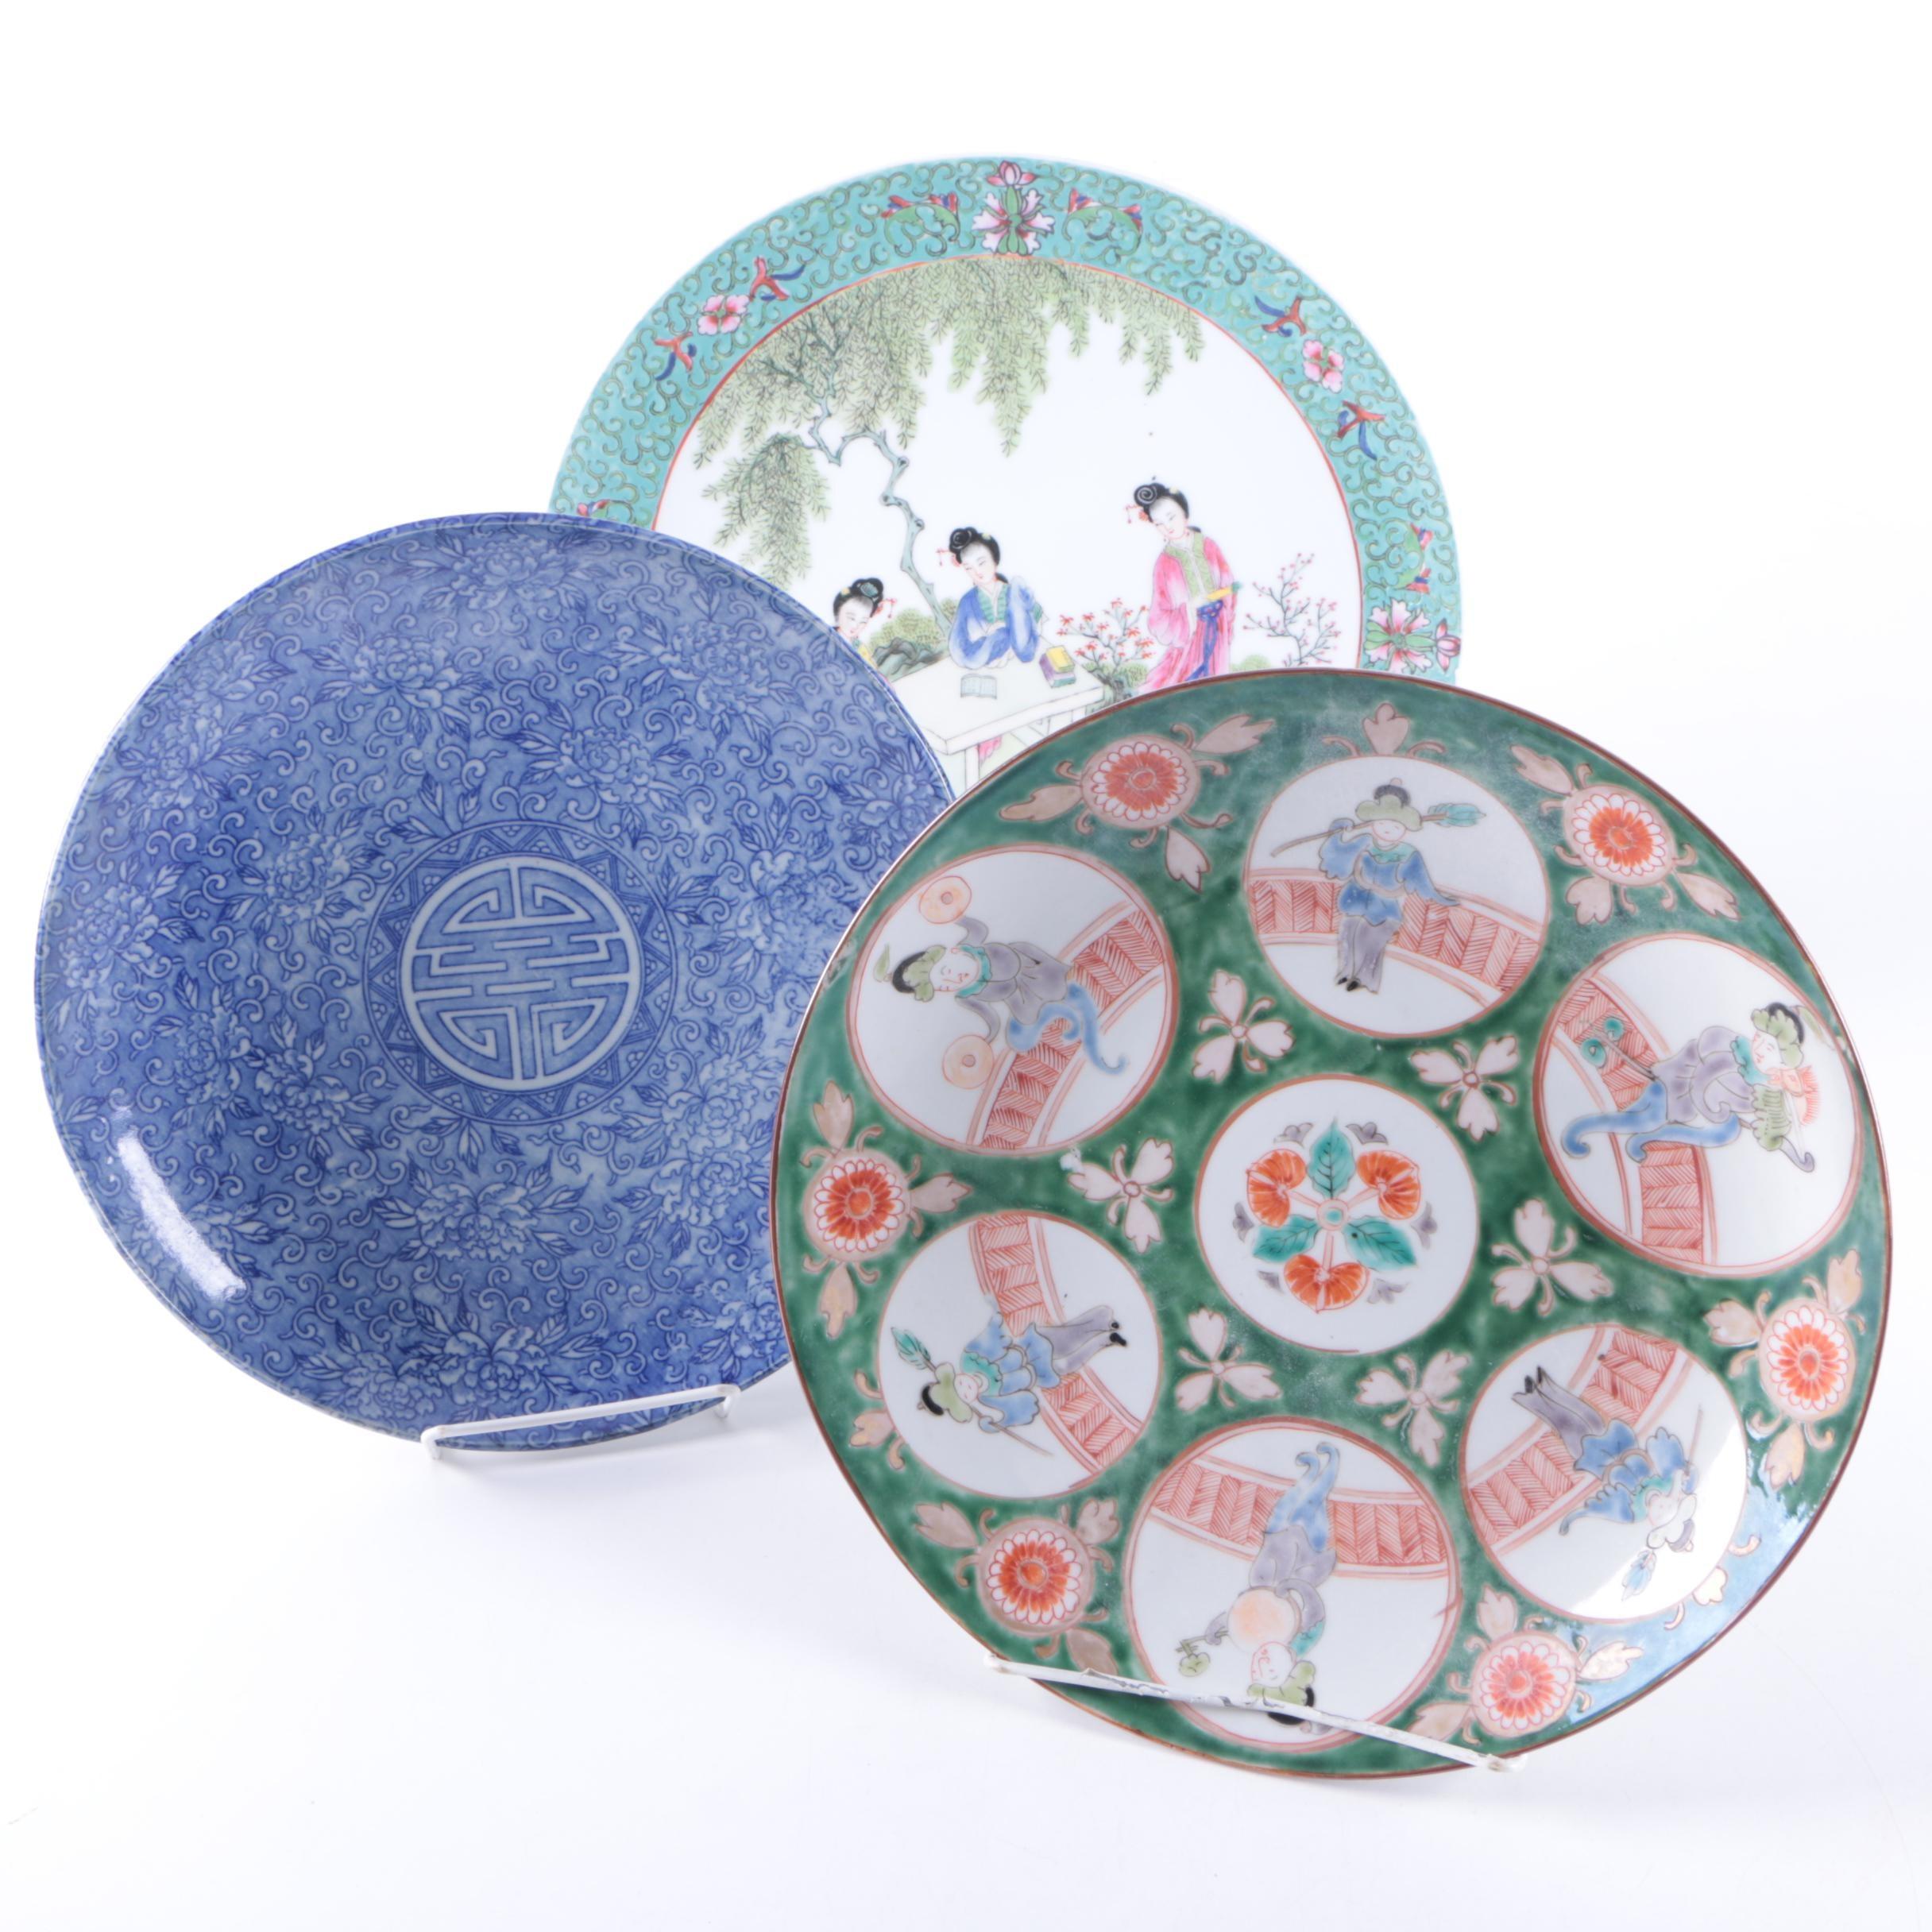 Decorative Chinese Porcelain Plates ...  sc 1 st  EBTH.com & Decorative Chinese Porcelain Plates : EBTH